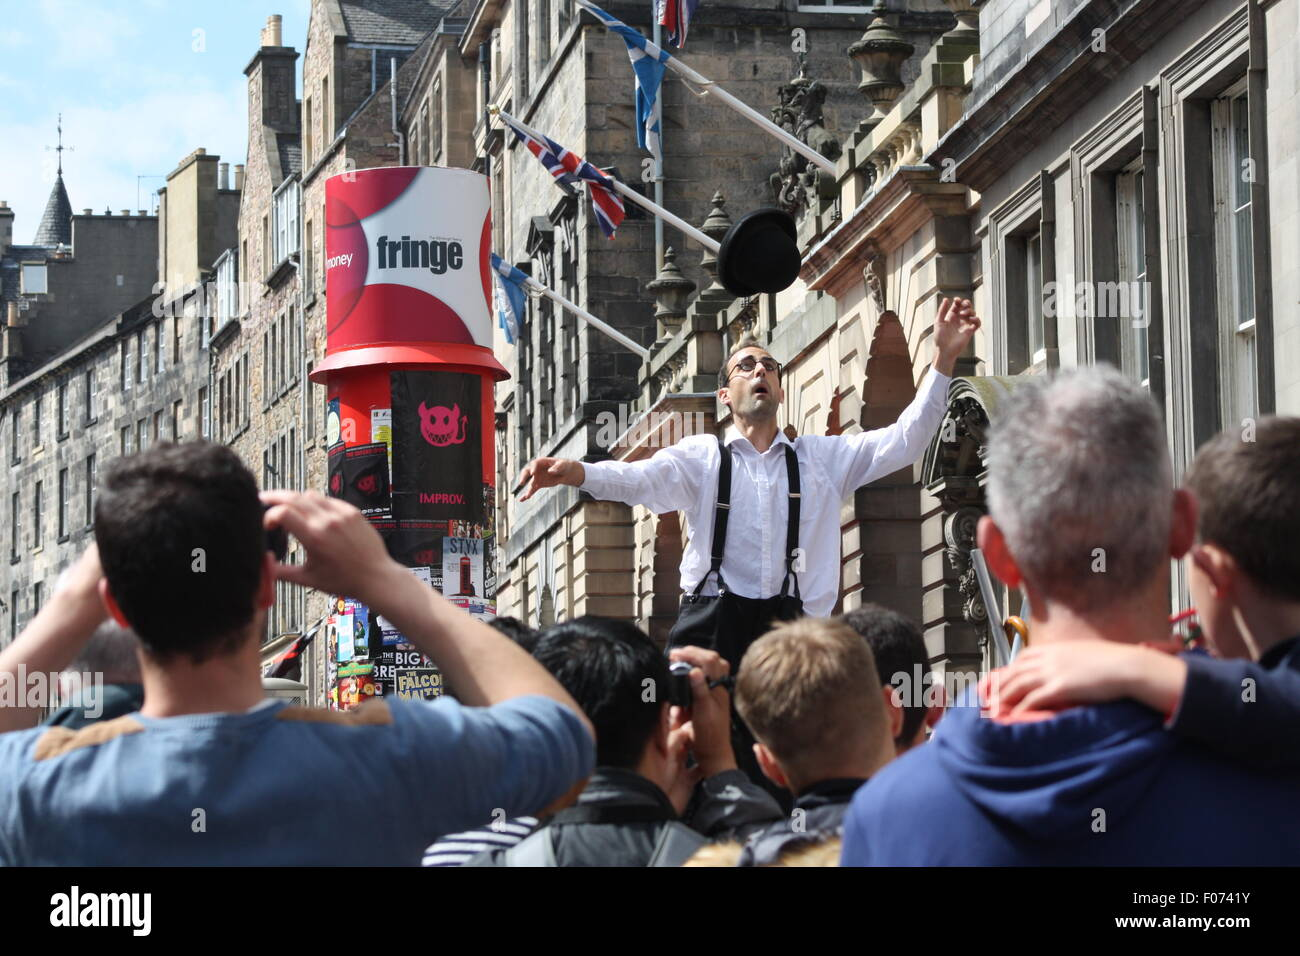 Street performers on the Royal Mile at the Edinburgh Fringe Festival 2015. - Stock Image